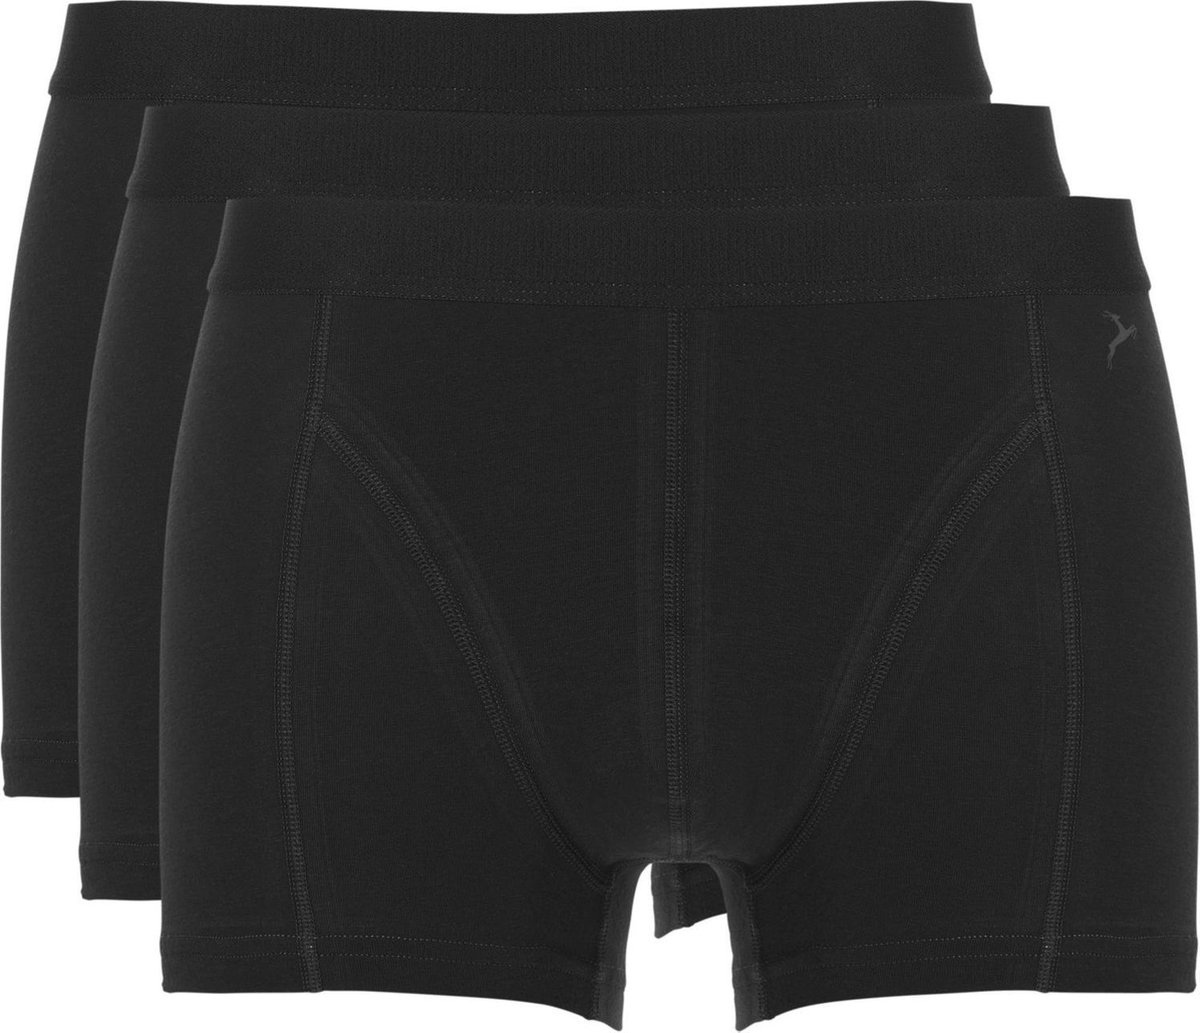 Ten Cate Shorty 3Pack Basic Zwart - Maat M